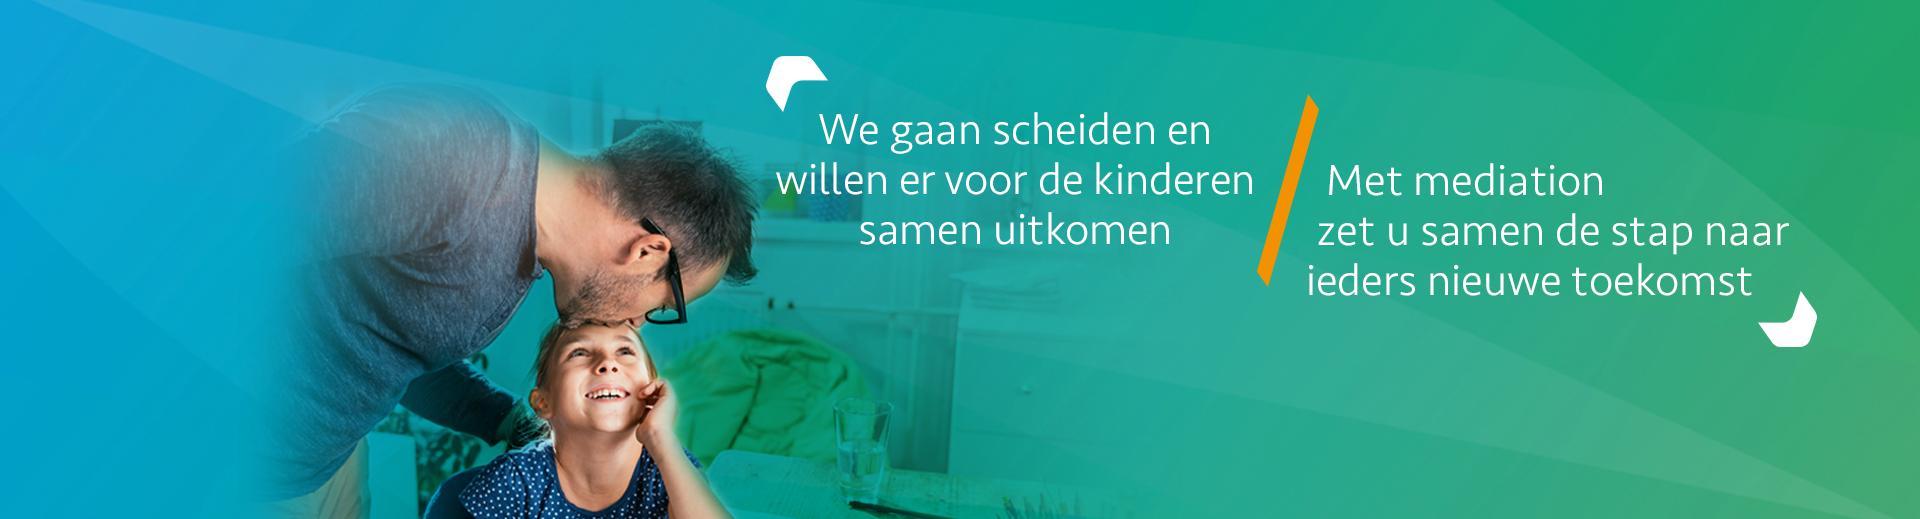 Mediation - Scheidingsplanner Almelo - Deventer - Nijverdal